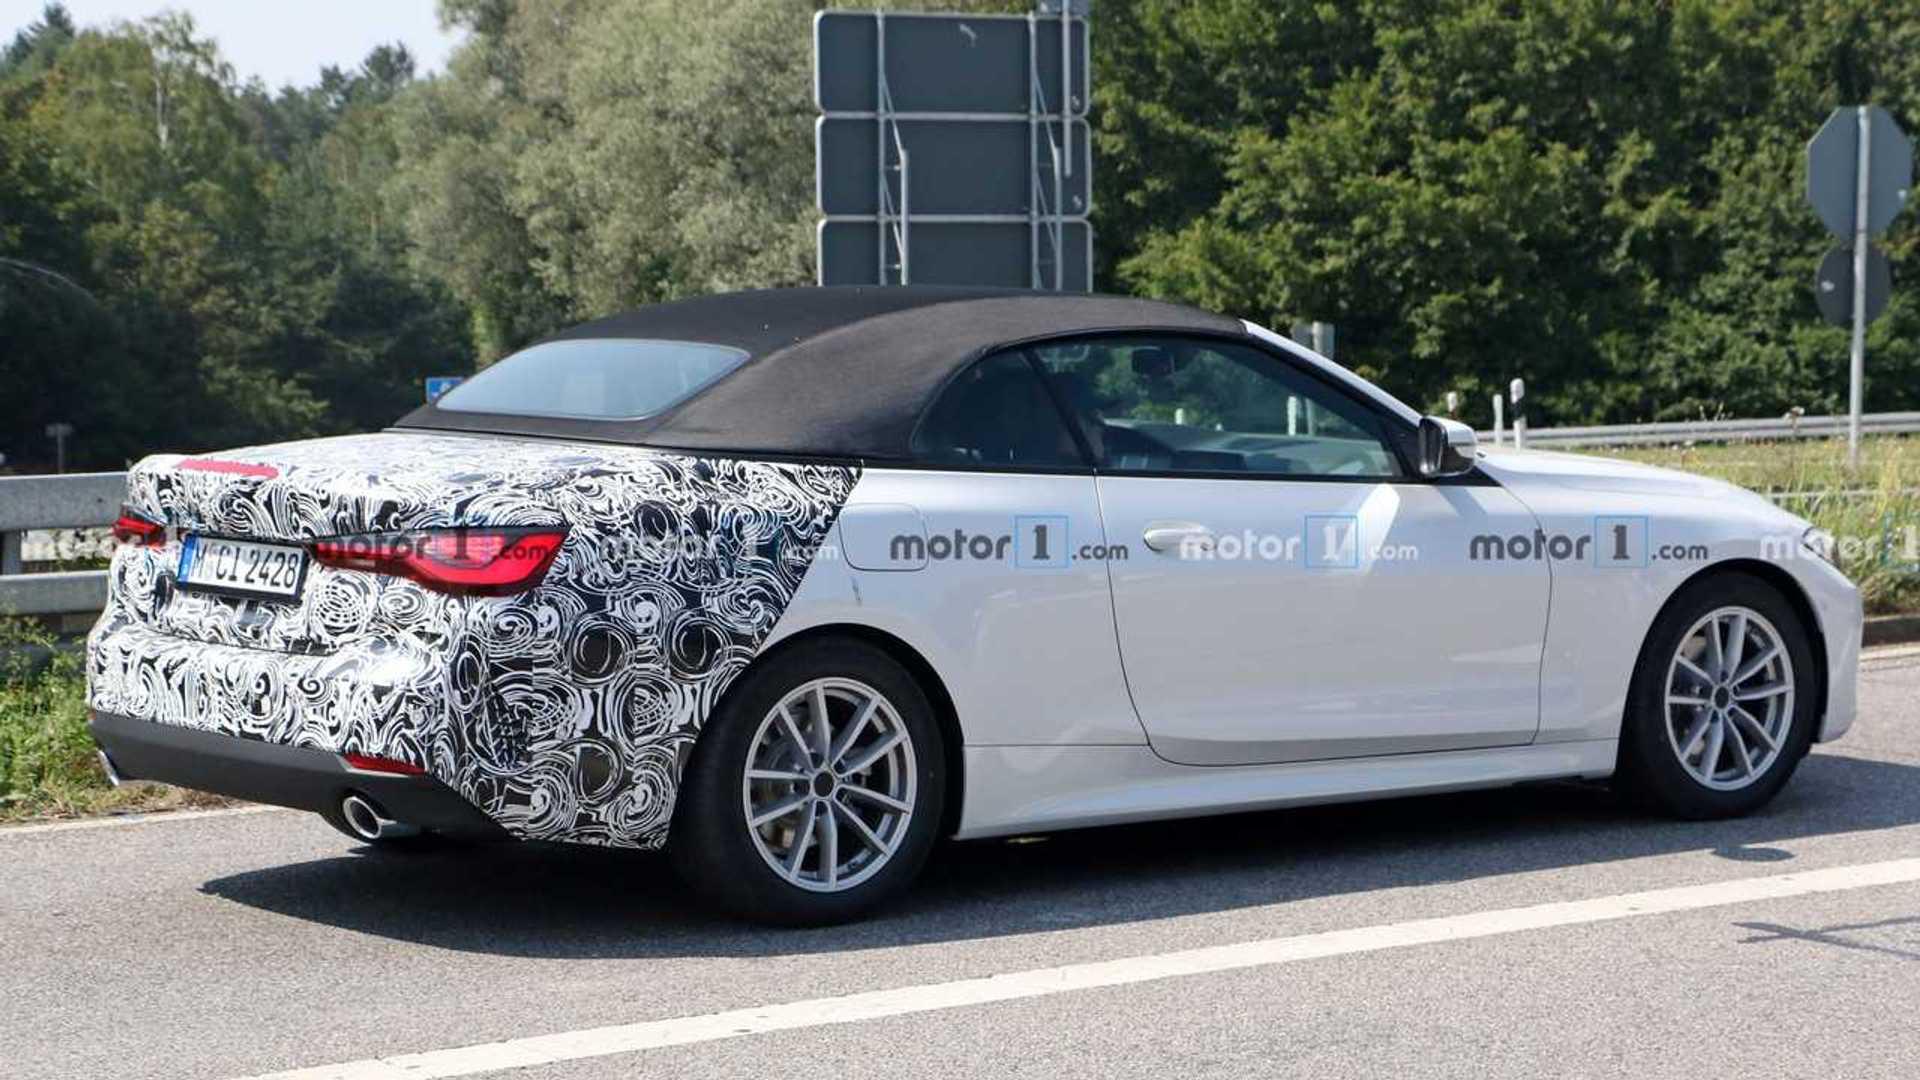 2020 - [BMW] Série 4 Coupé/Cabriolet G23-G22 - Page 16 New-bmw-4-series-convertible-rear-profile